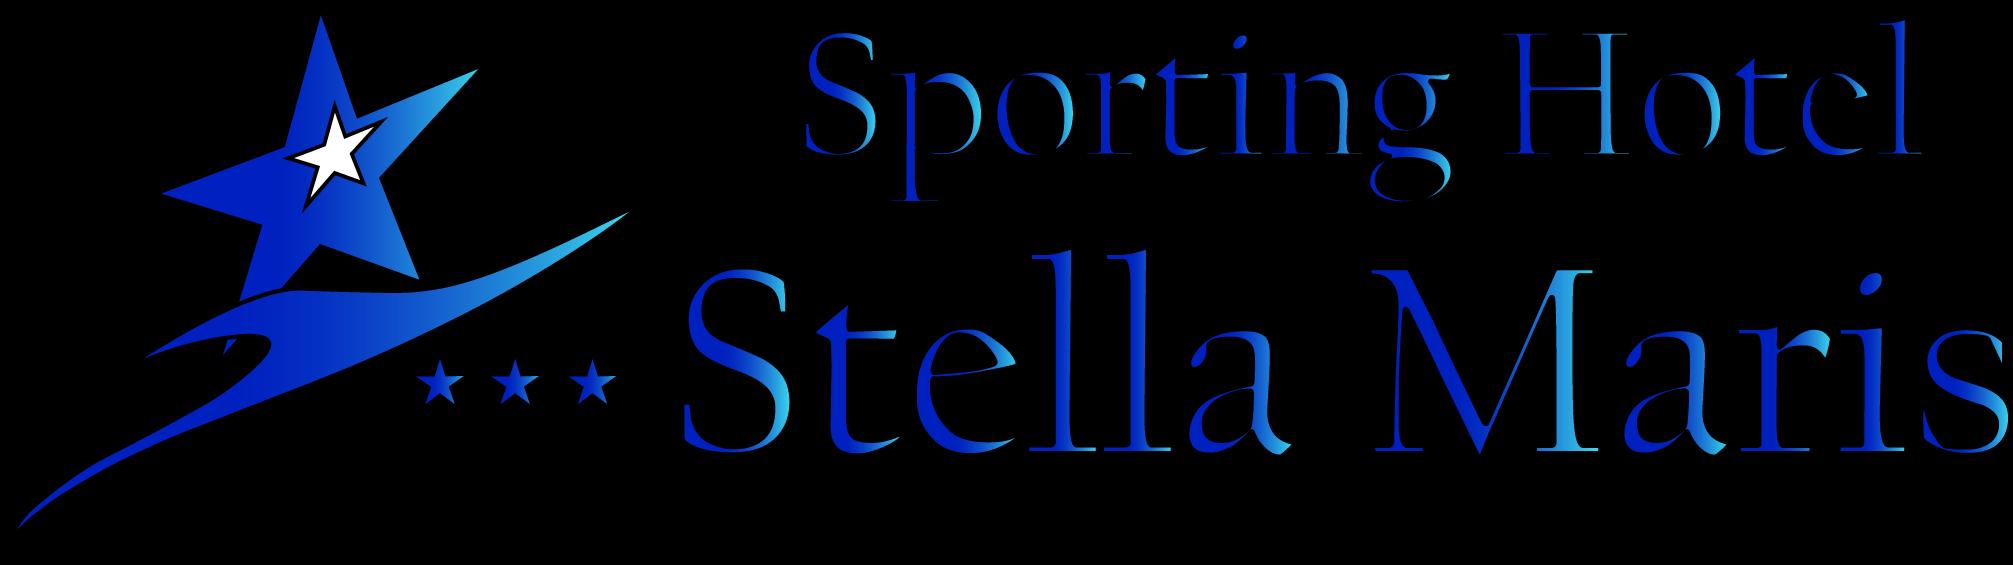 Sporting Hotel Stella Maris Bosa